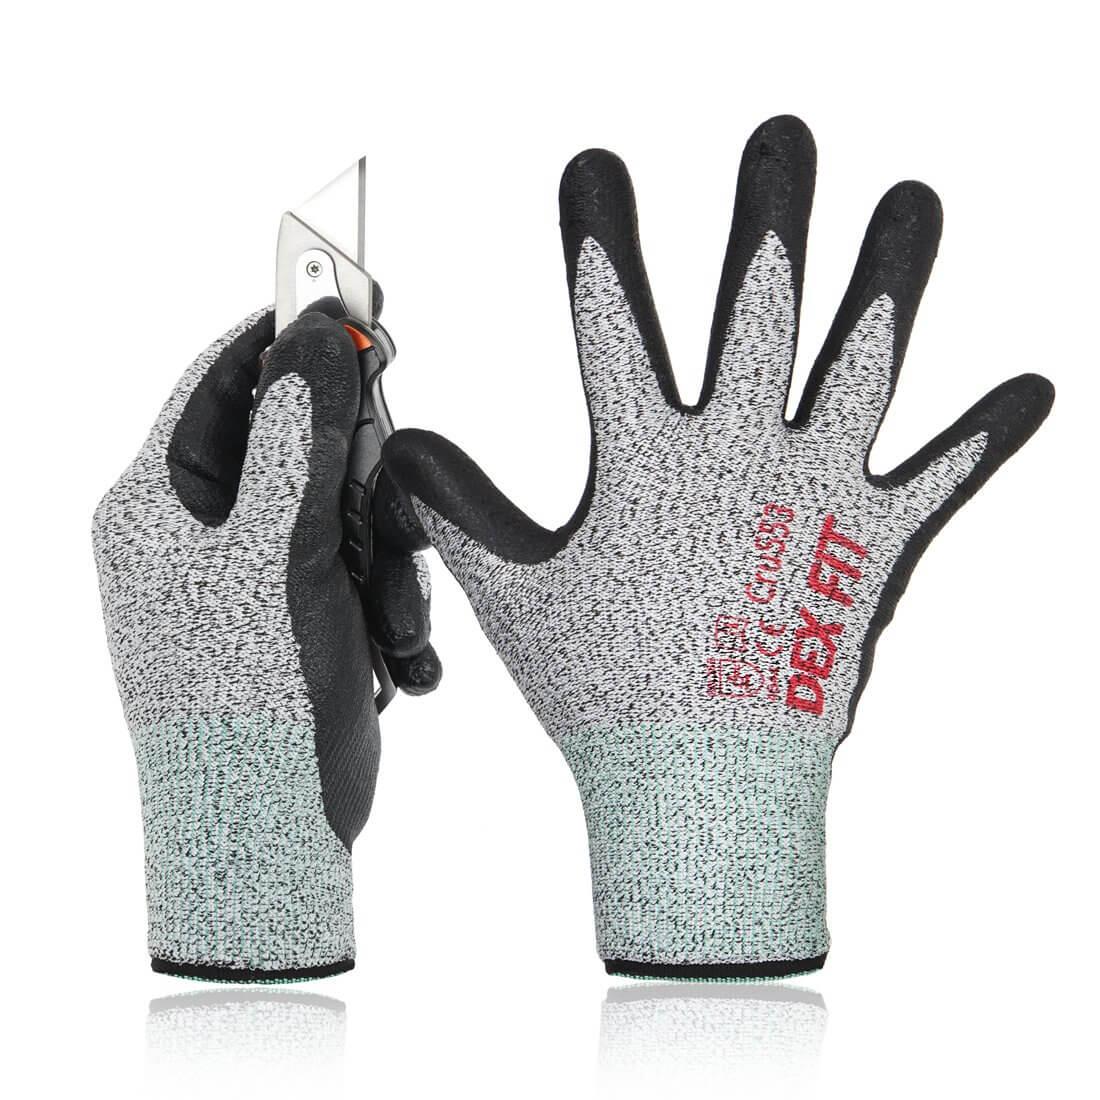 DEX FIT Level 5 Cut Resistant Gloves Cru553